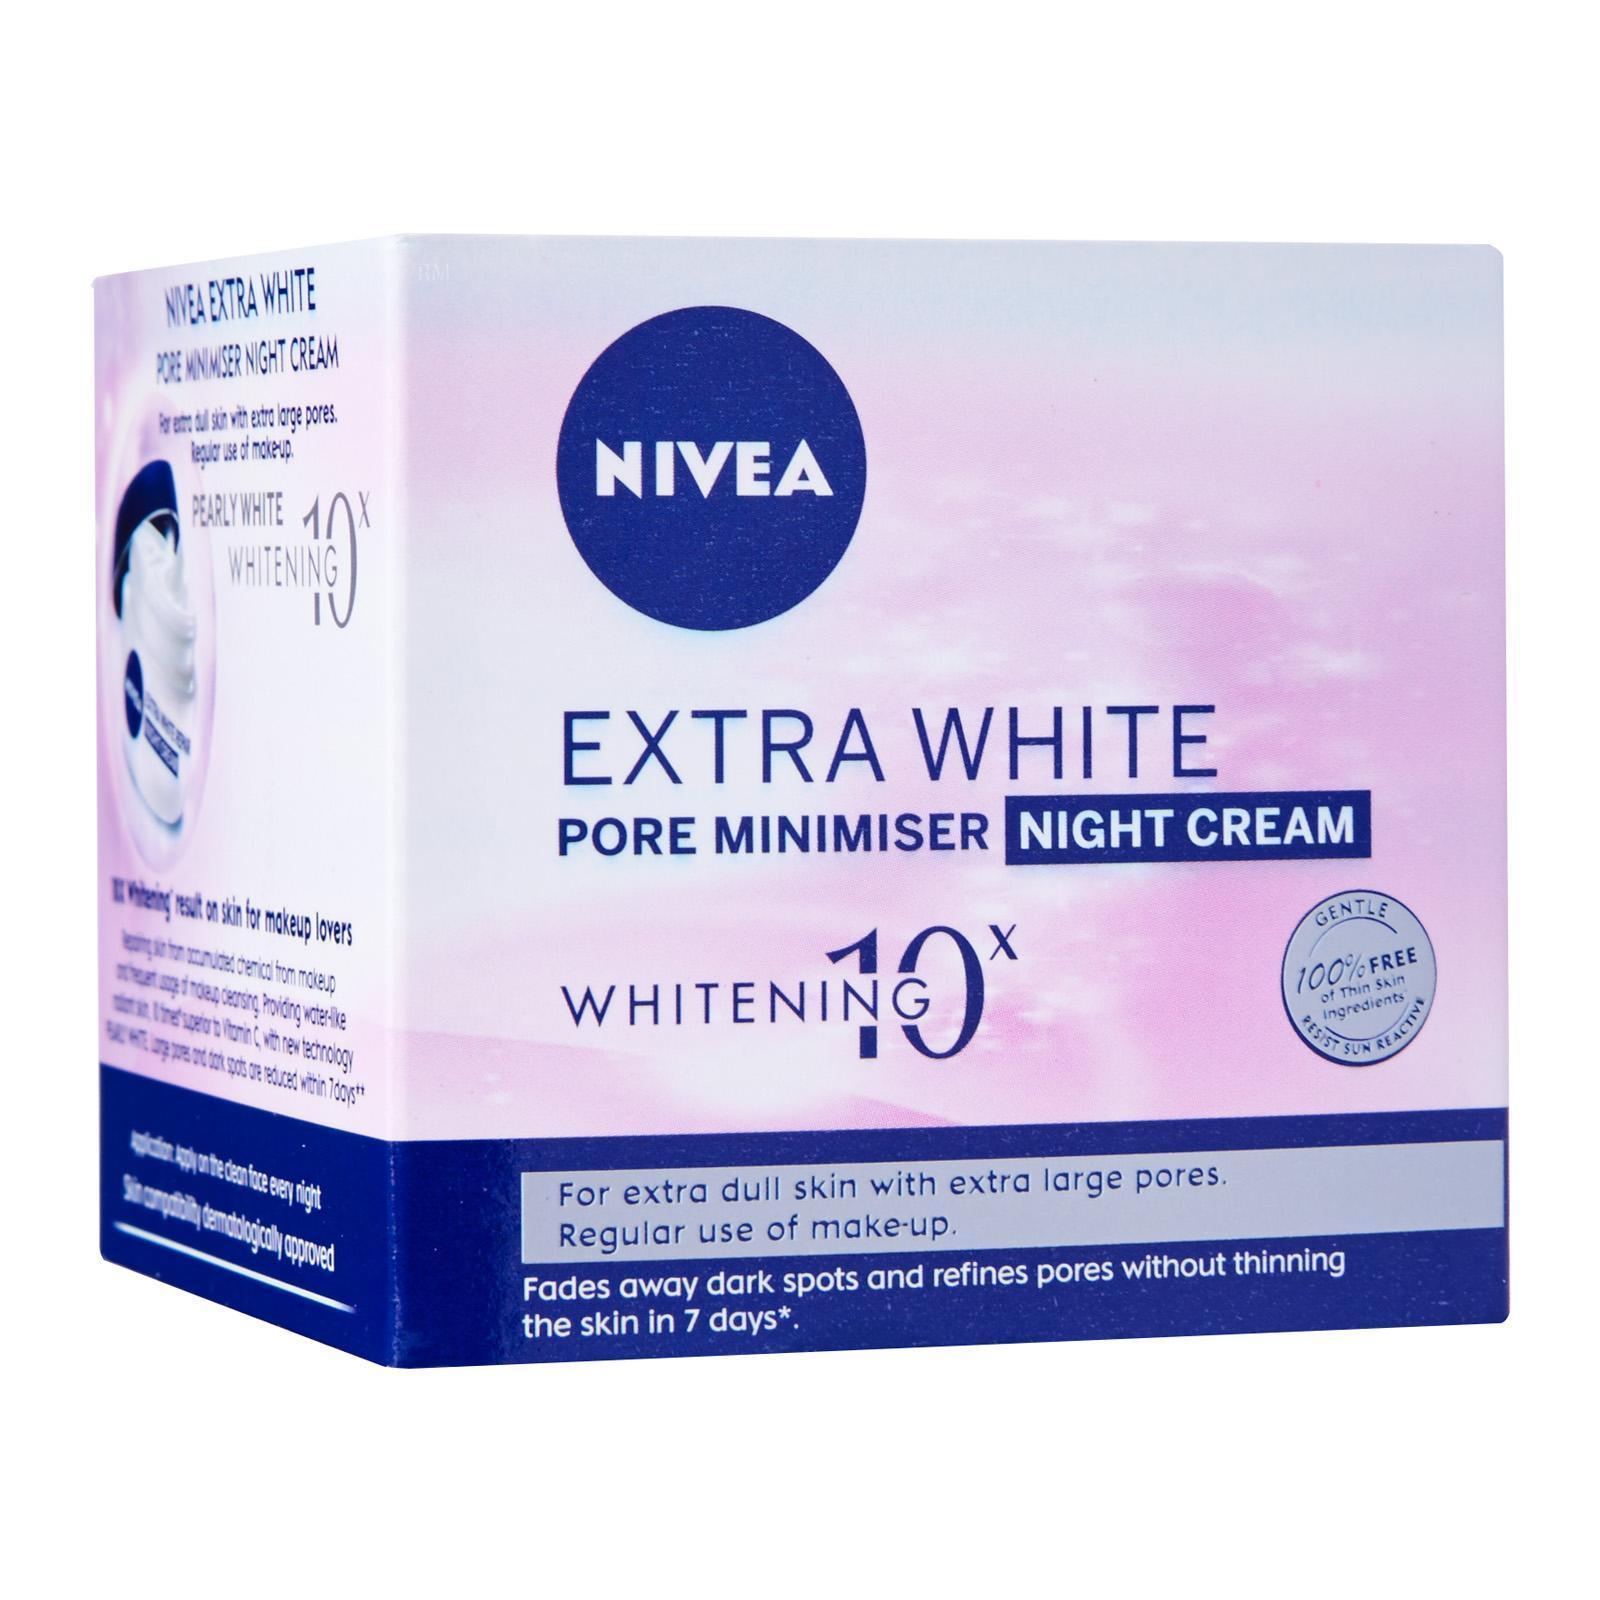 Nivea Face Care for Women Moisturiser Extra White Repair Night Cream